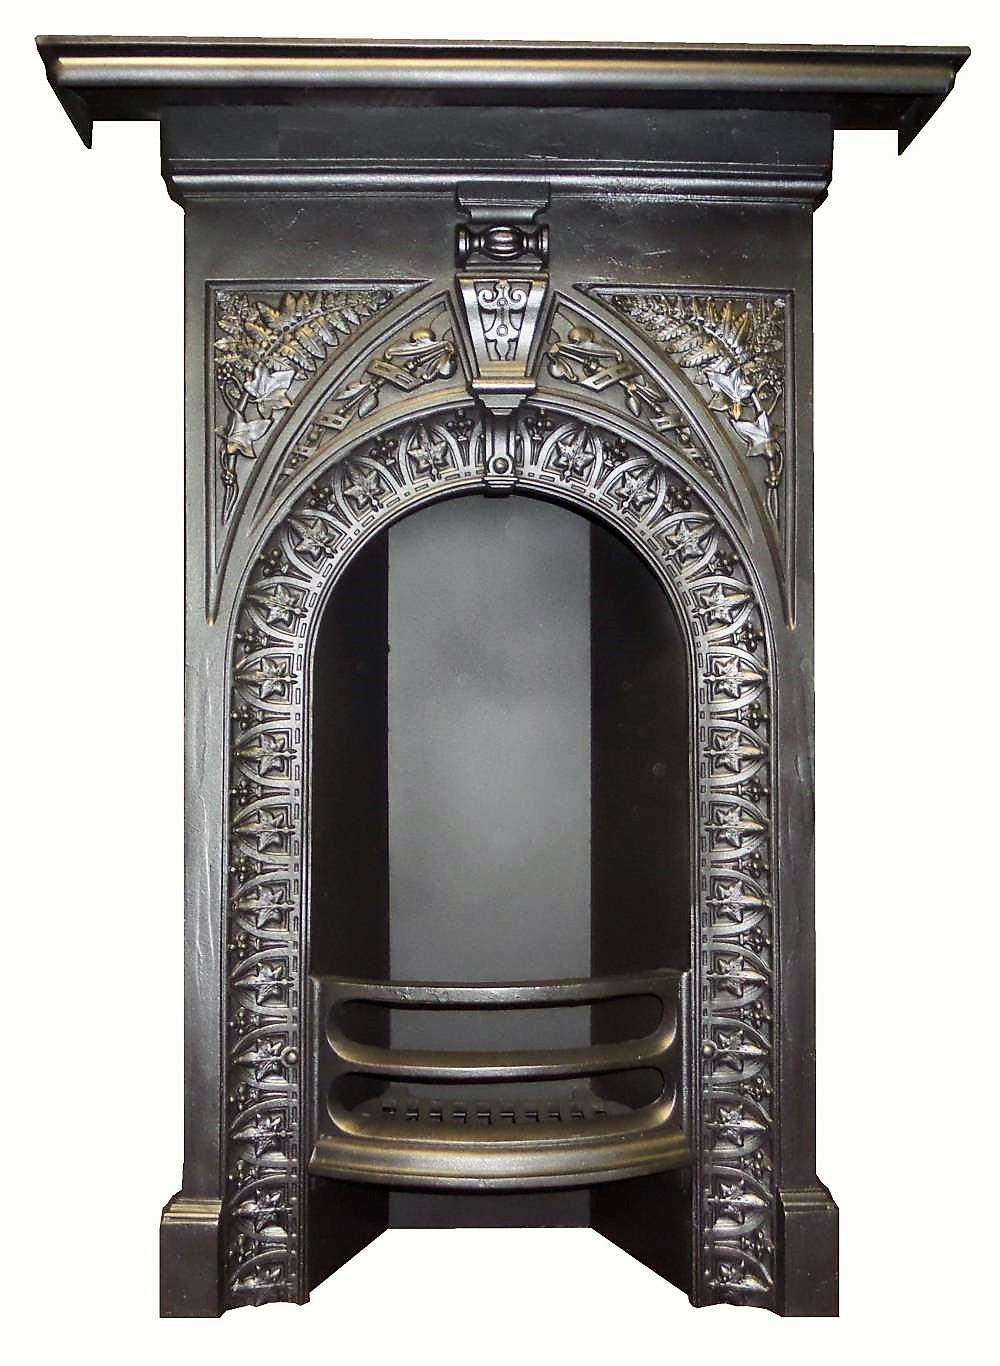 Buy Online Antique Bedroom Victorian Cast Iron Fireplace